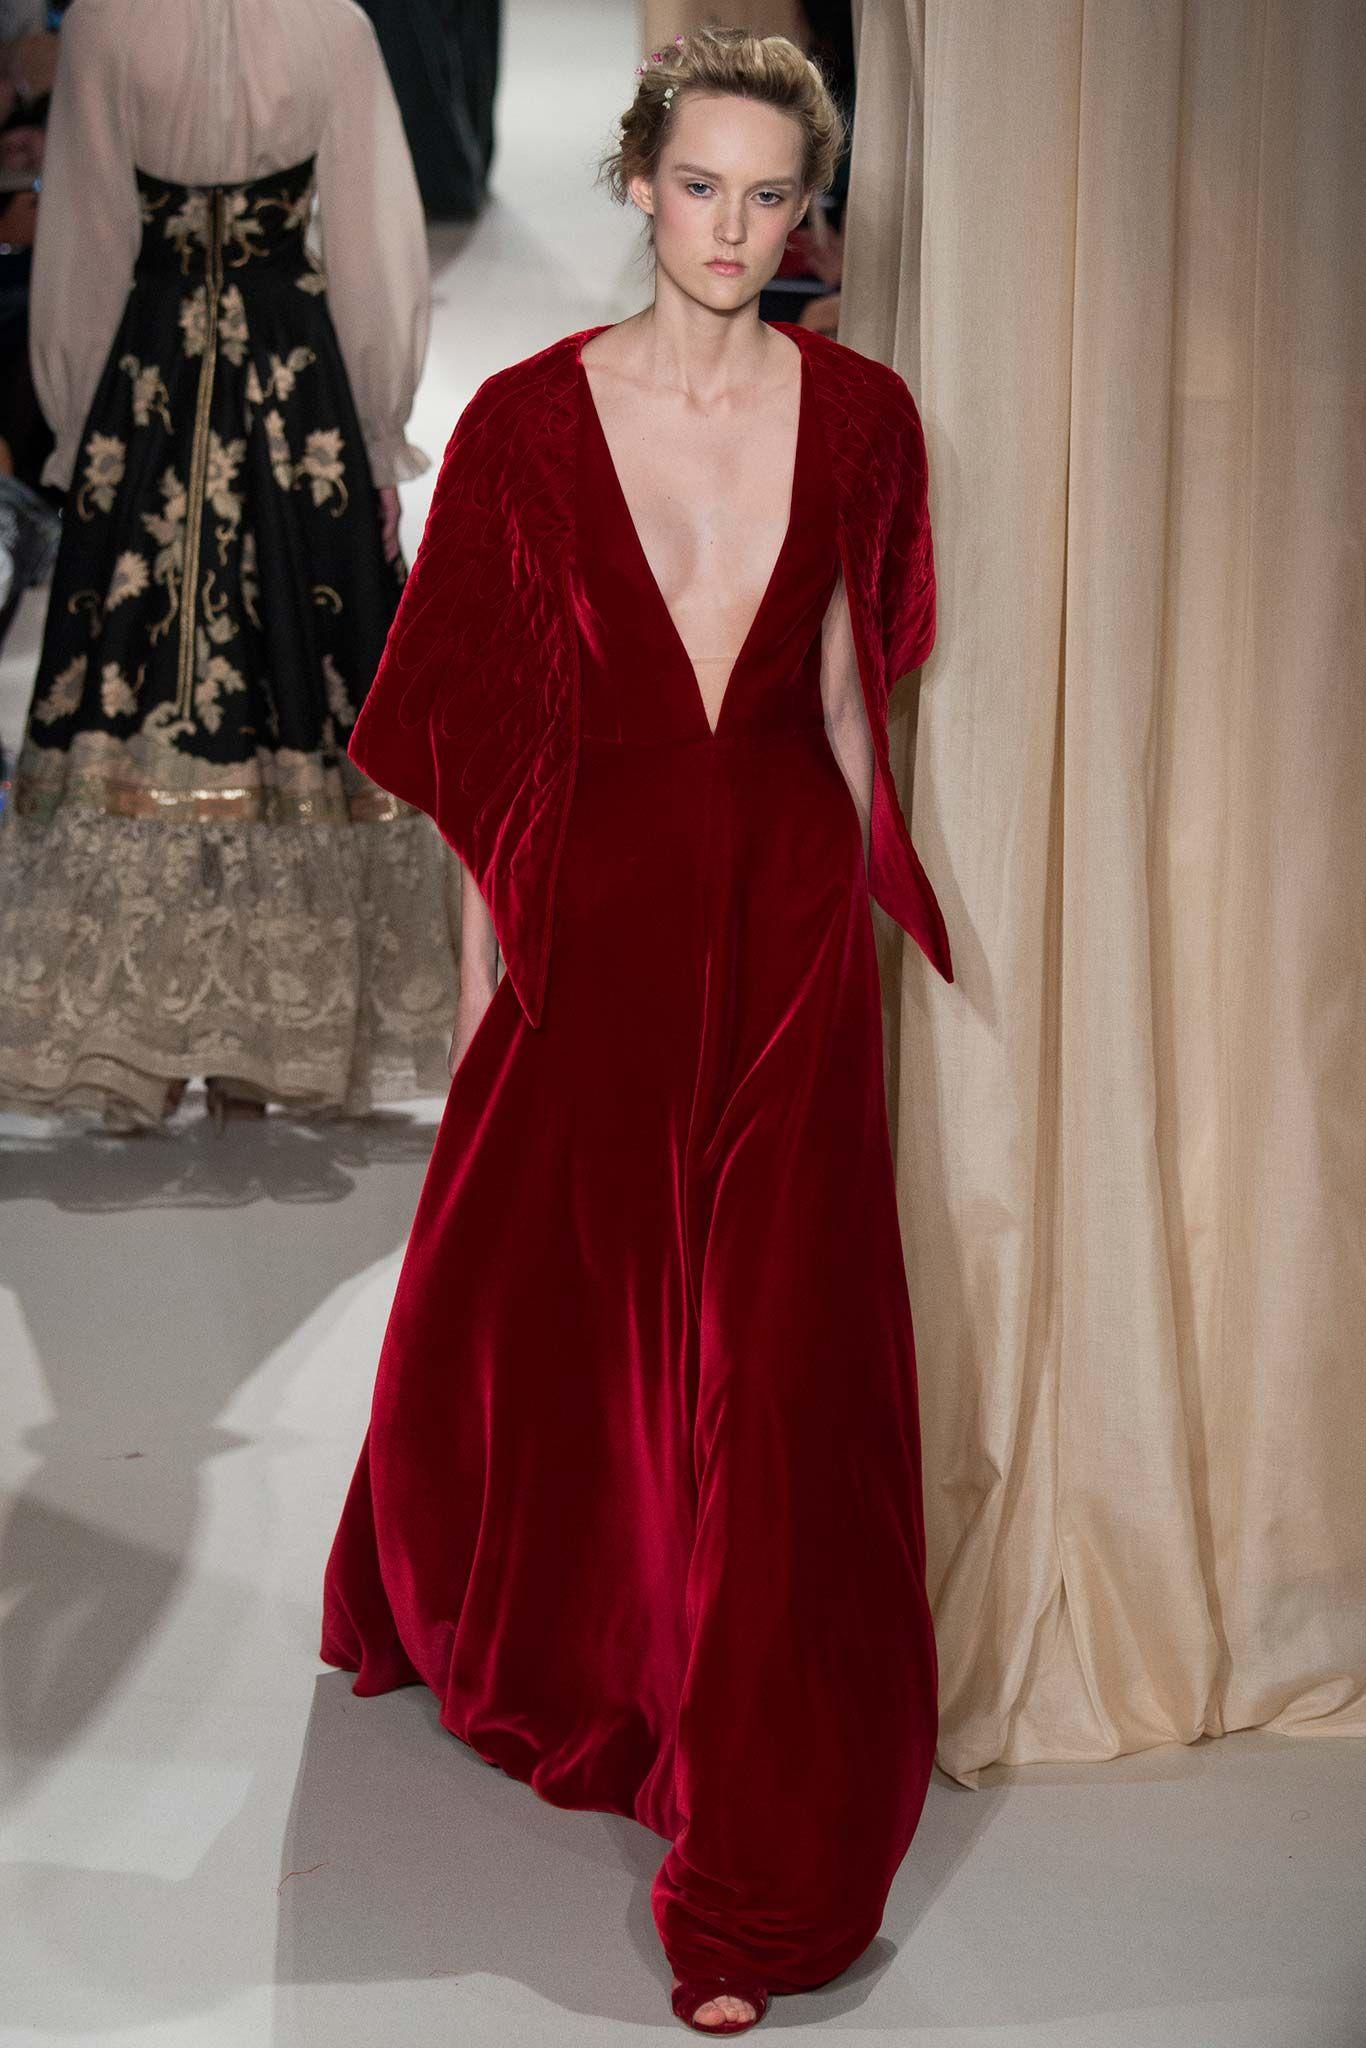 0f77a9a07492b vestido alta costura. valentino. decote. vermelho.   BEAUTY FASHION ...